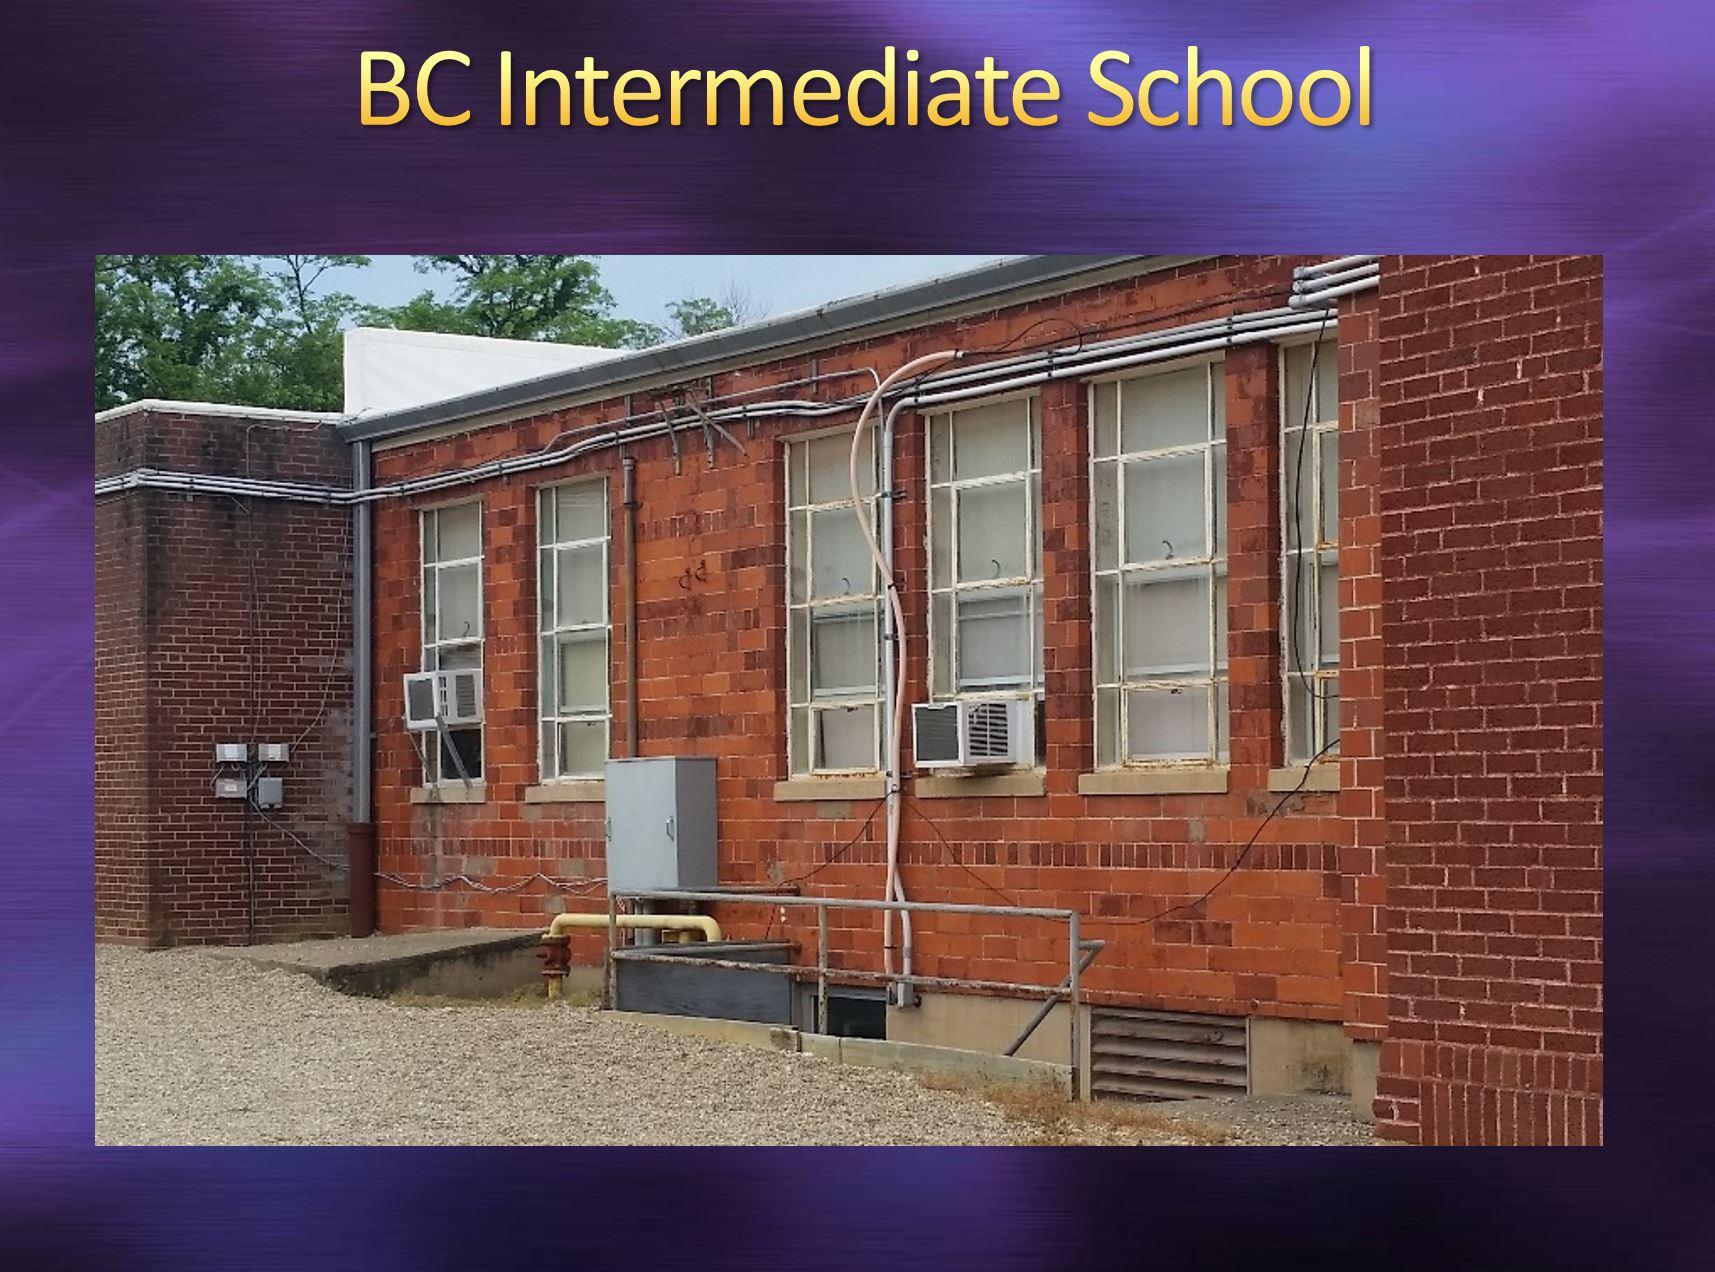 BC Intermediate School